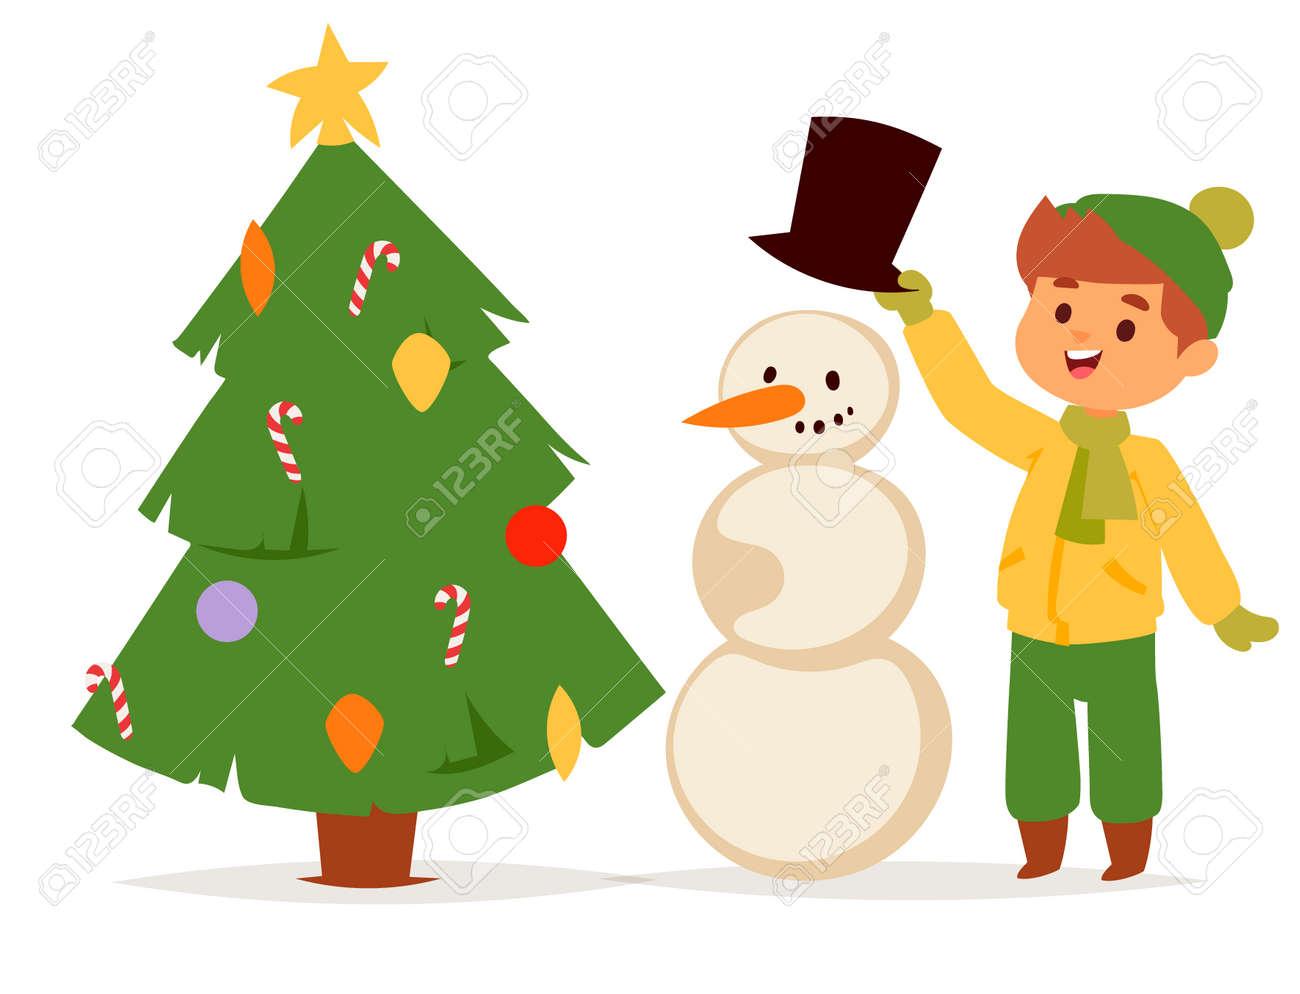 christmas kids vector character playing winter games winter children holidays christmas tree cartoon new year xmas